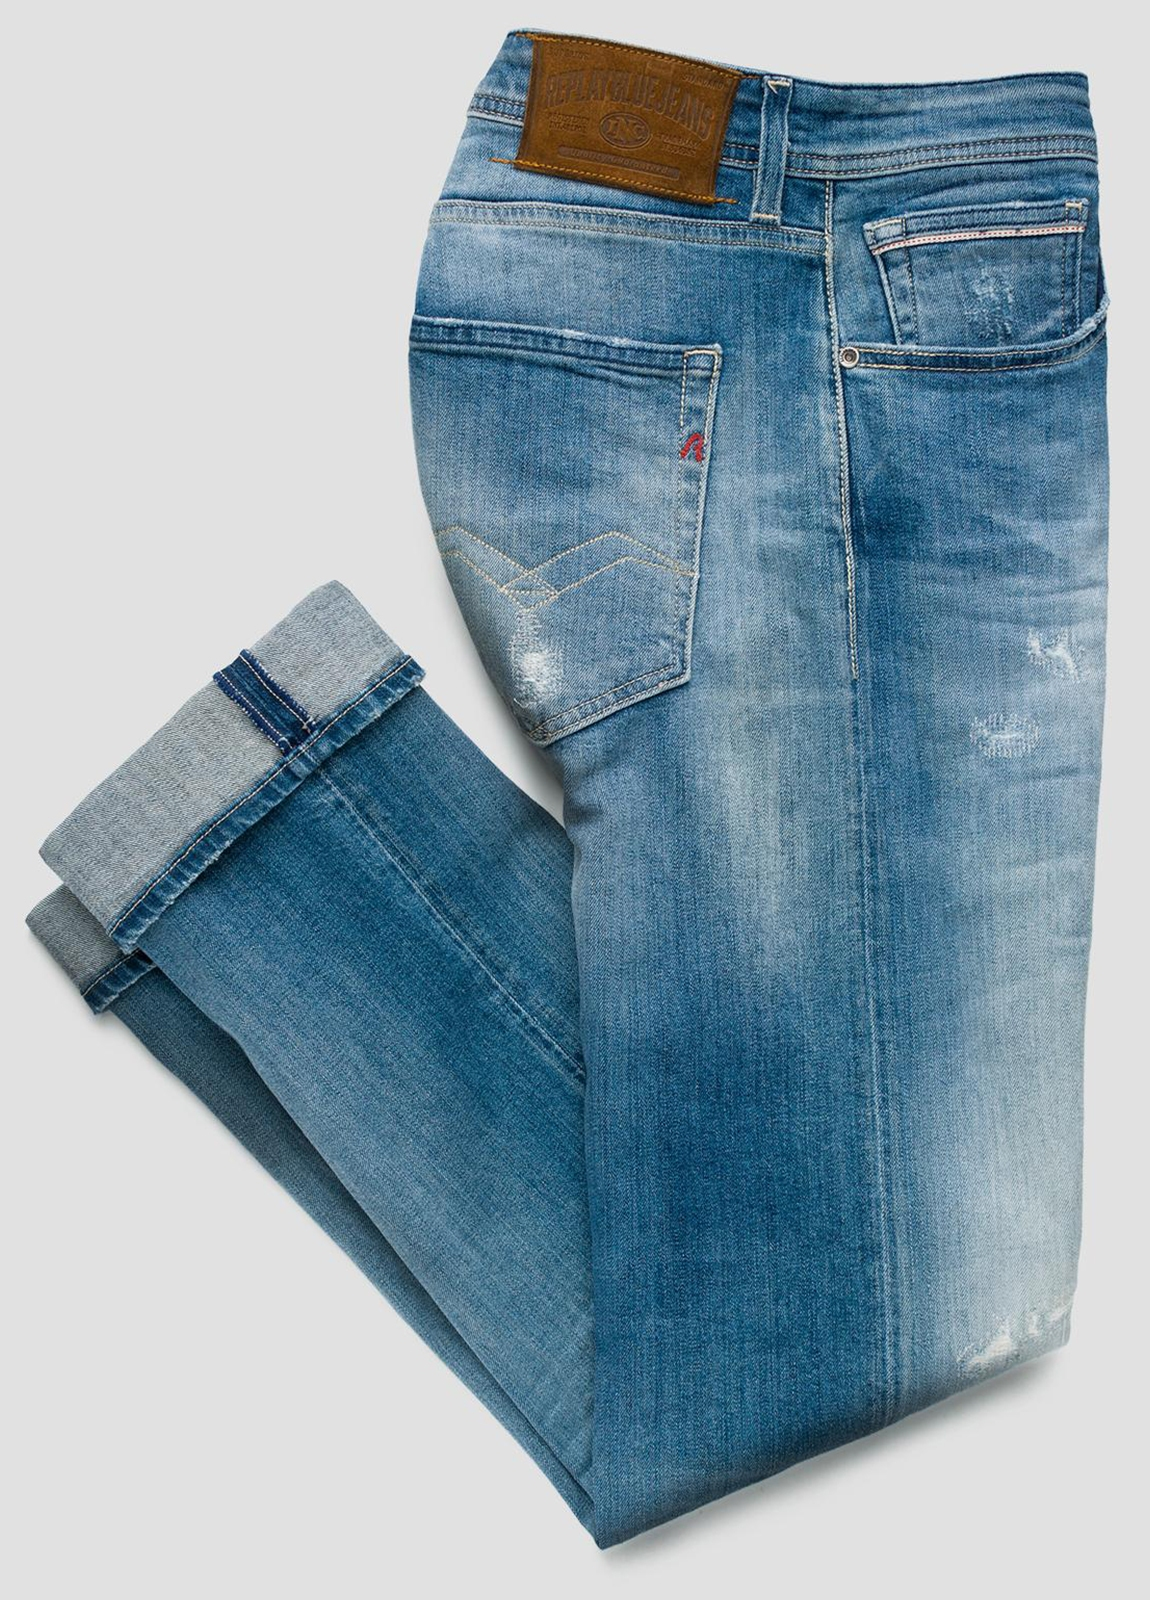 Pantalón tejano 10,5 oz REGULAR 972 GROVER color azul medio lavado. 98% Algodón 2% Elastano.